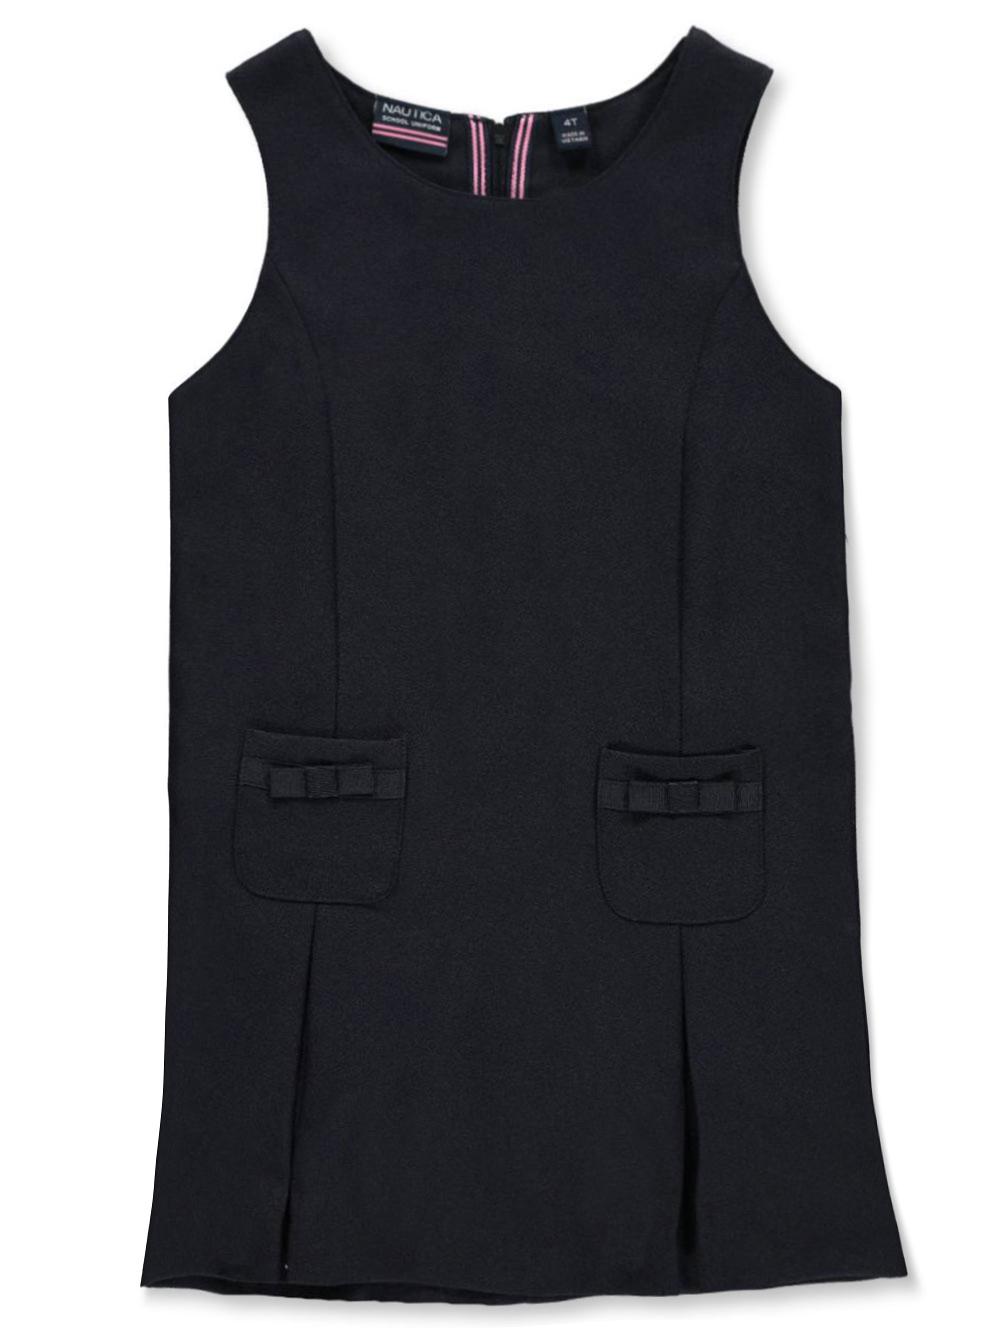 Nautica Childrens Apparel Toddler Girls Ribbed Sweater W// Metallic